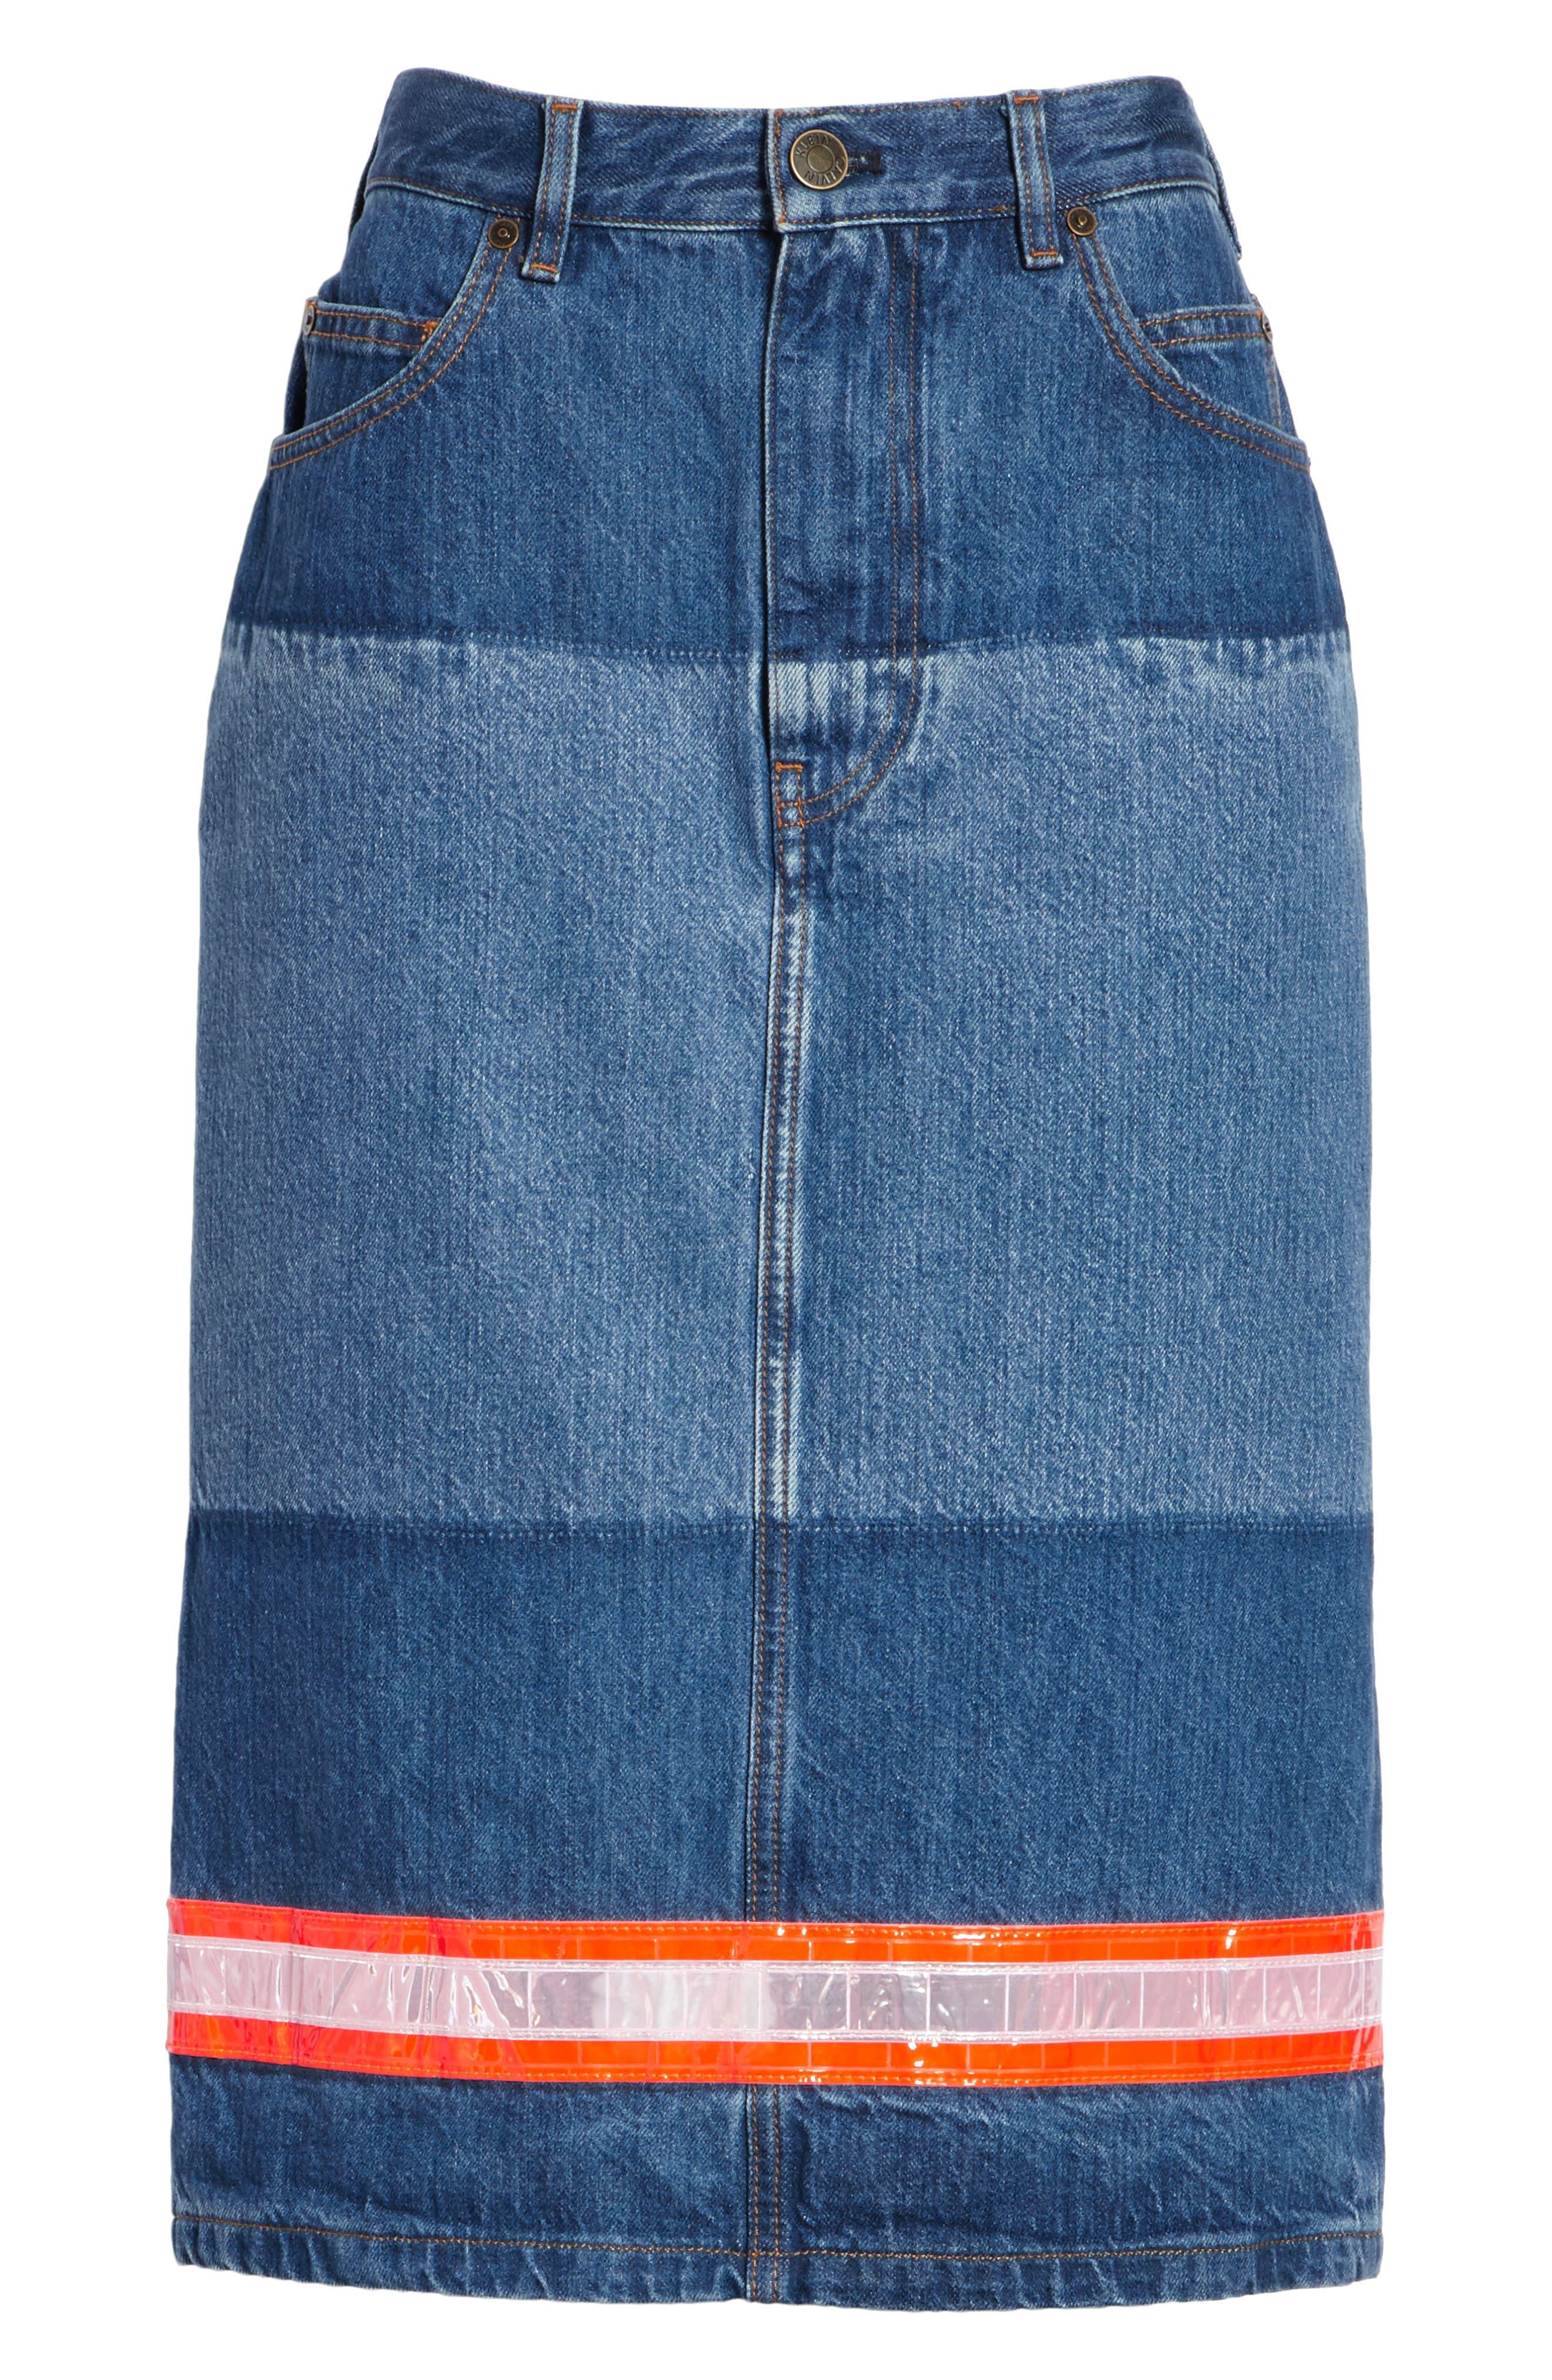 CALVIN KLEIN 205W39NYC, Reflective Stripe Mixed Wash Denim Skirt, Alternate thumbnail 6, color, BLUE